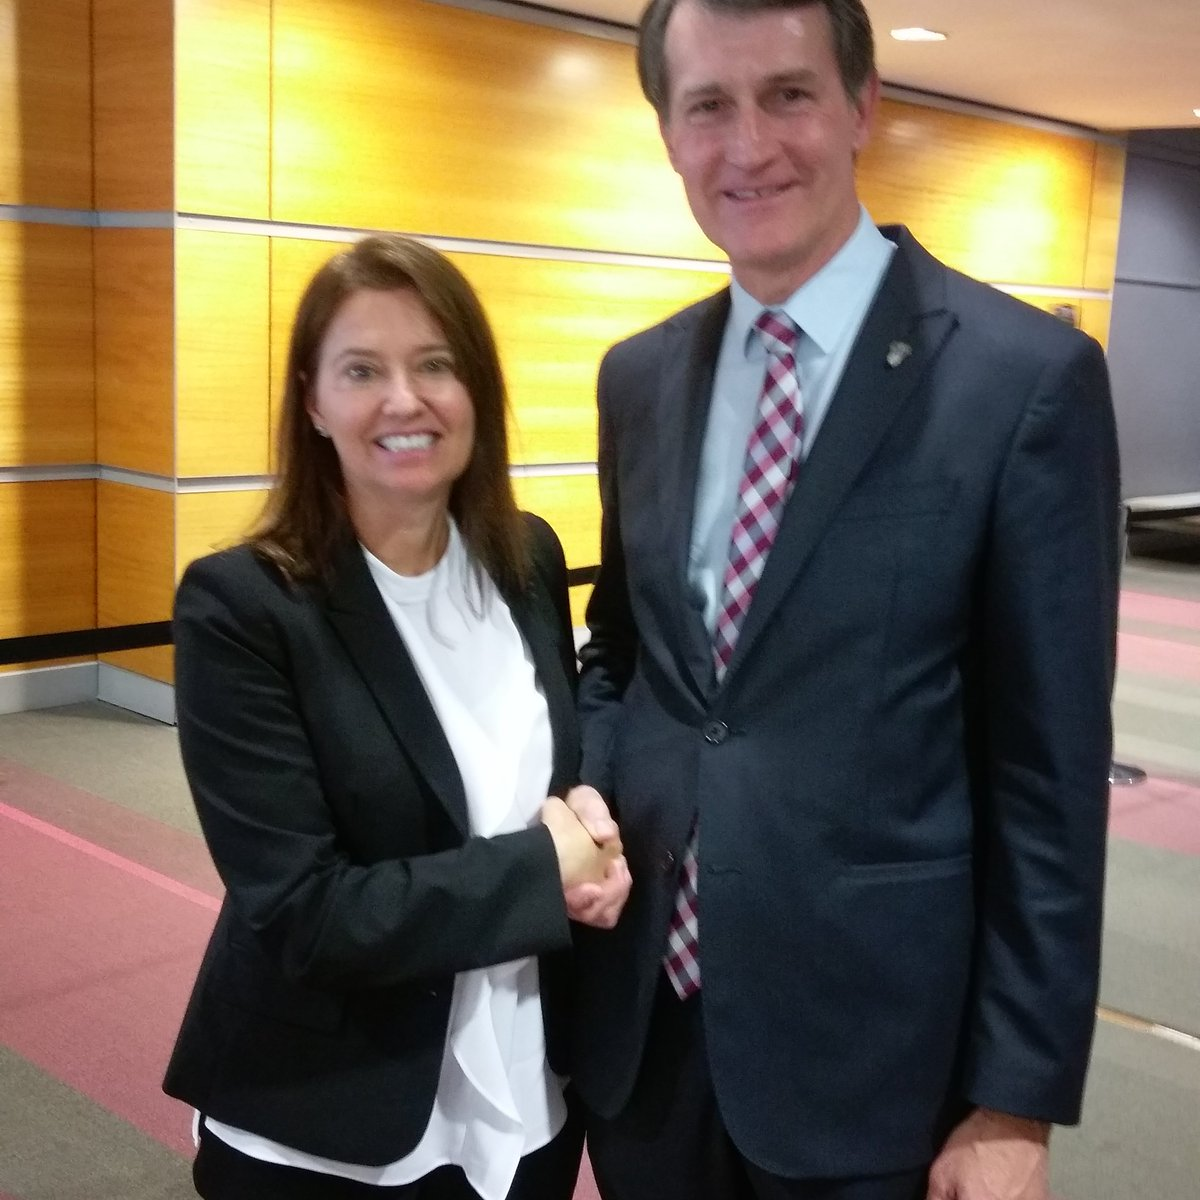 Karen Hodgson of #Translationz enjoyed meeting the Lord Mayor of Brisbane Graham Quirk at the Opening Ceremony of #fitcongress2017 <br>http://pic.twitter.com/kIebU4DzED